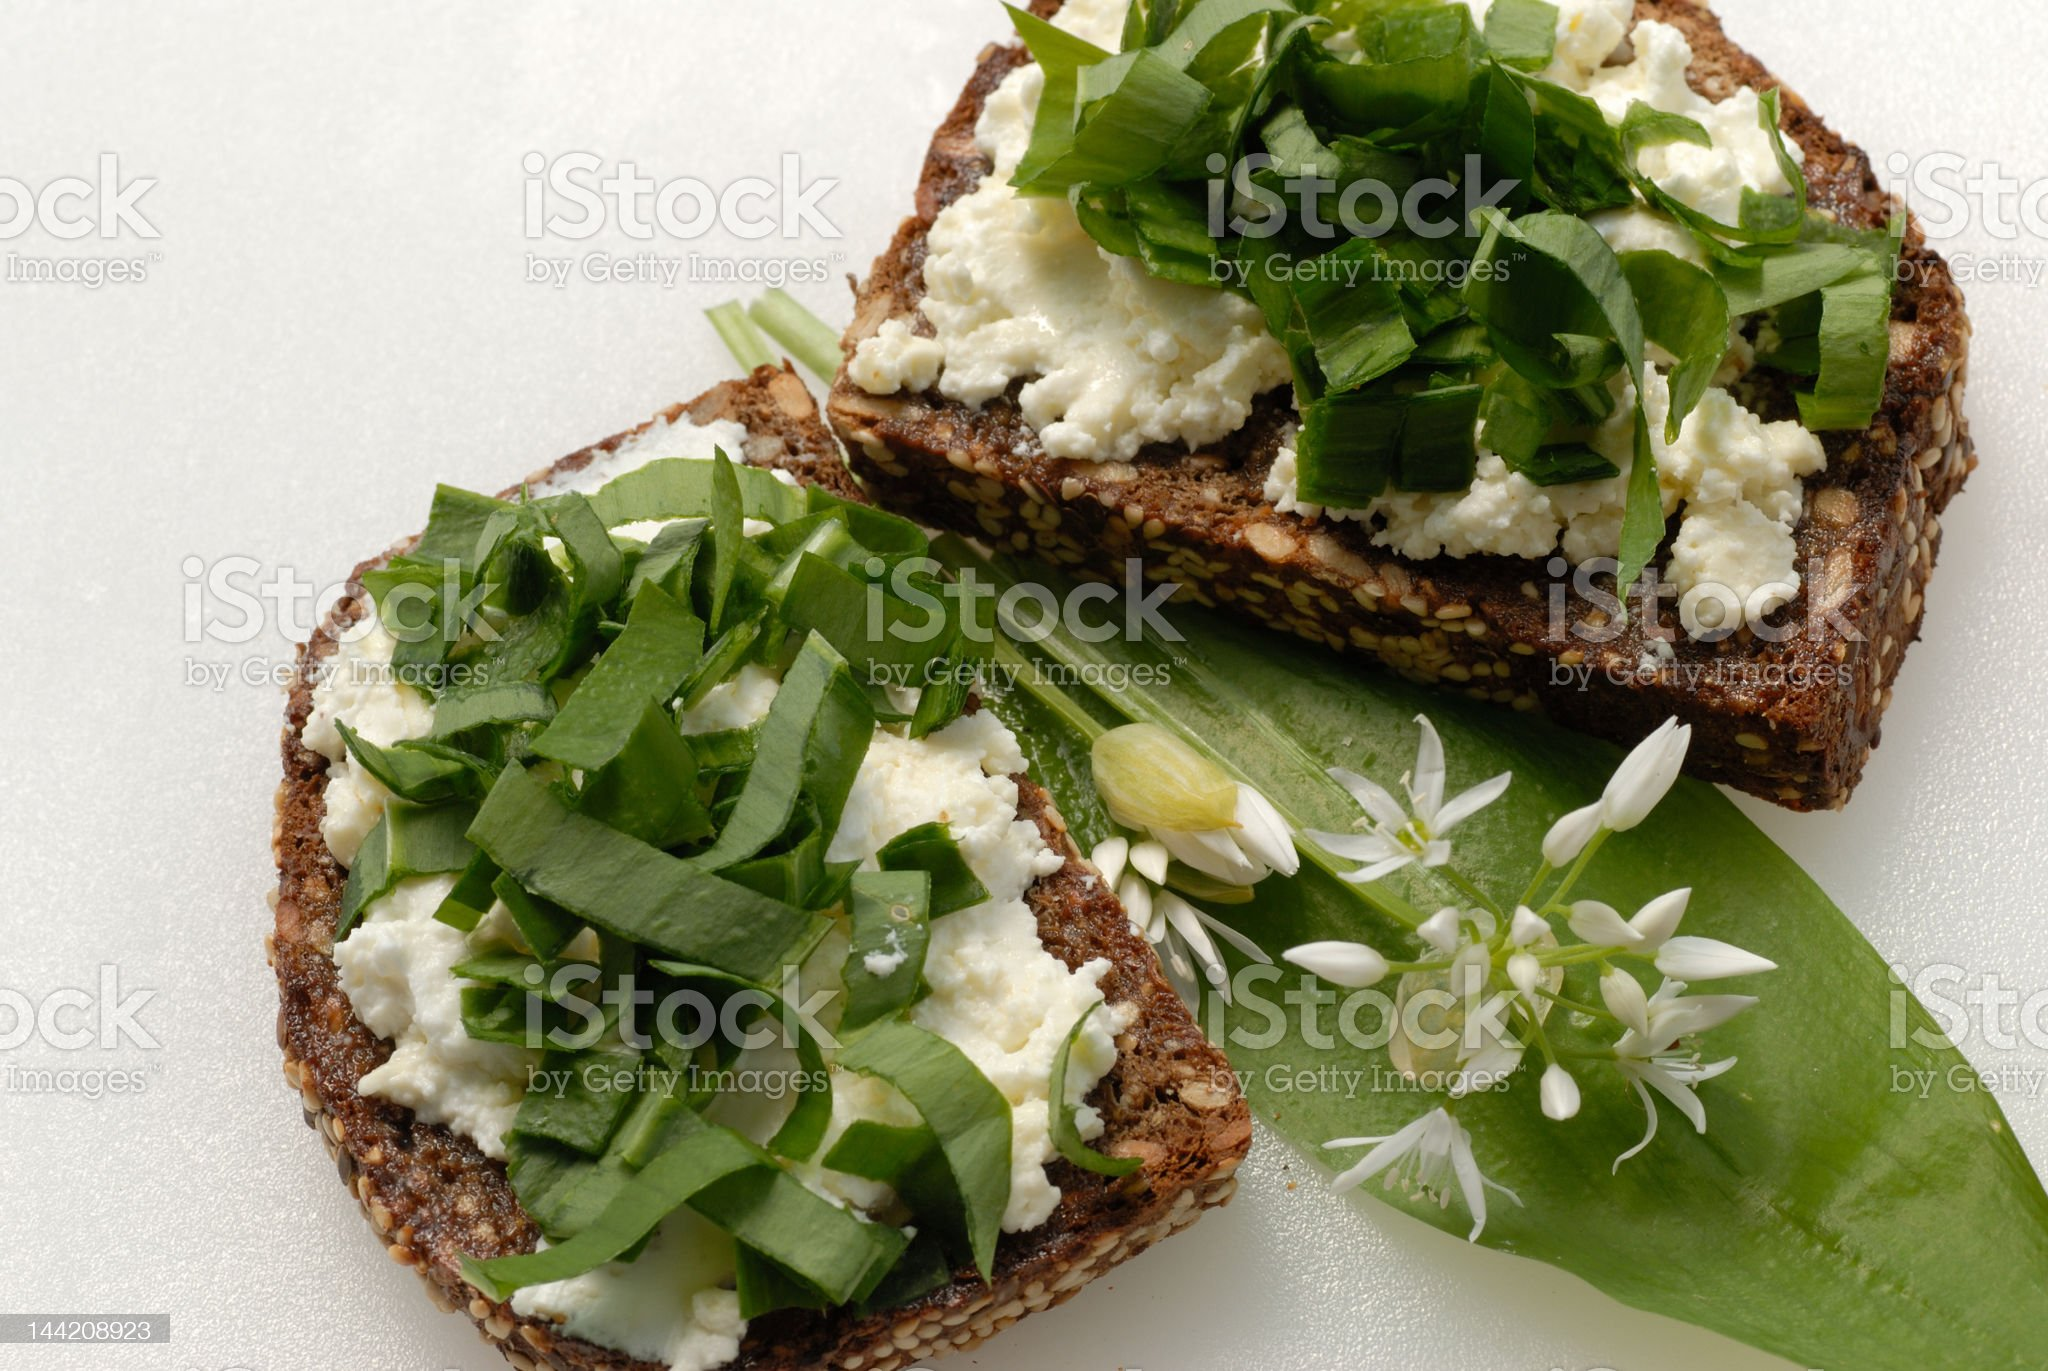 Ramson on spreaded slice of bread royalty-free stock photo